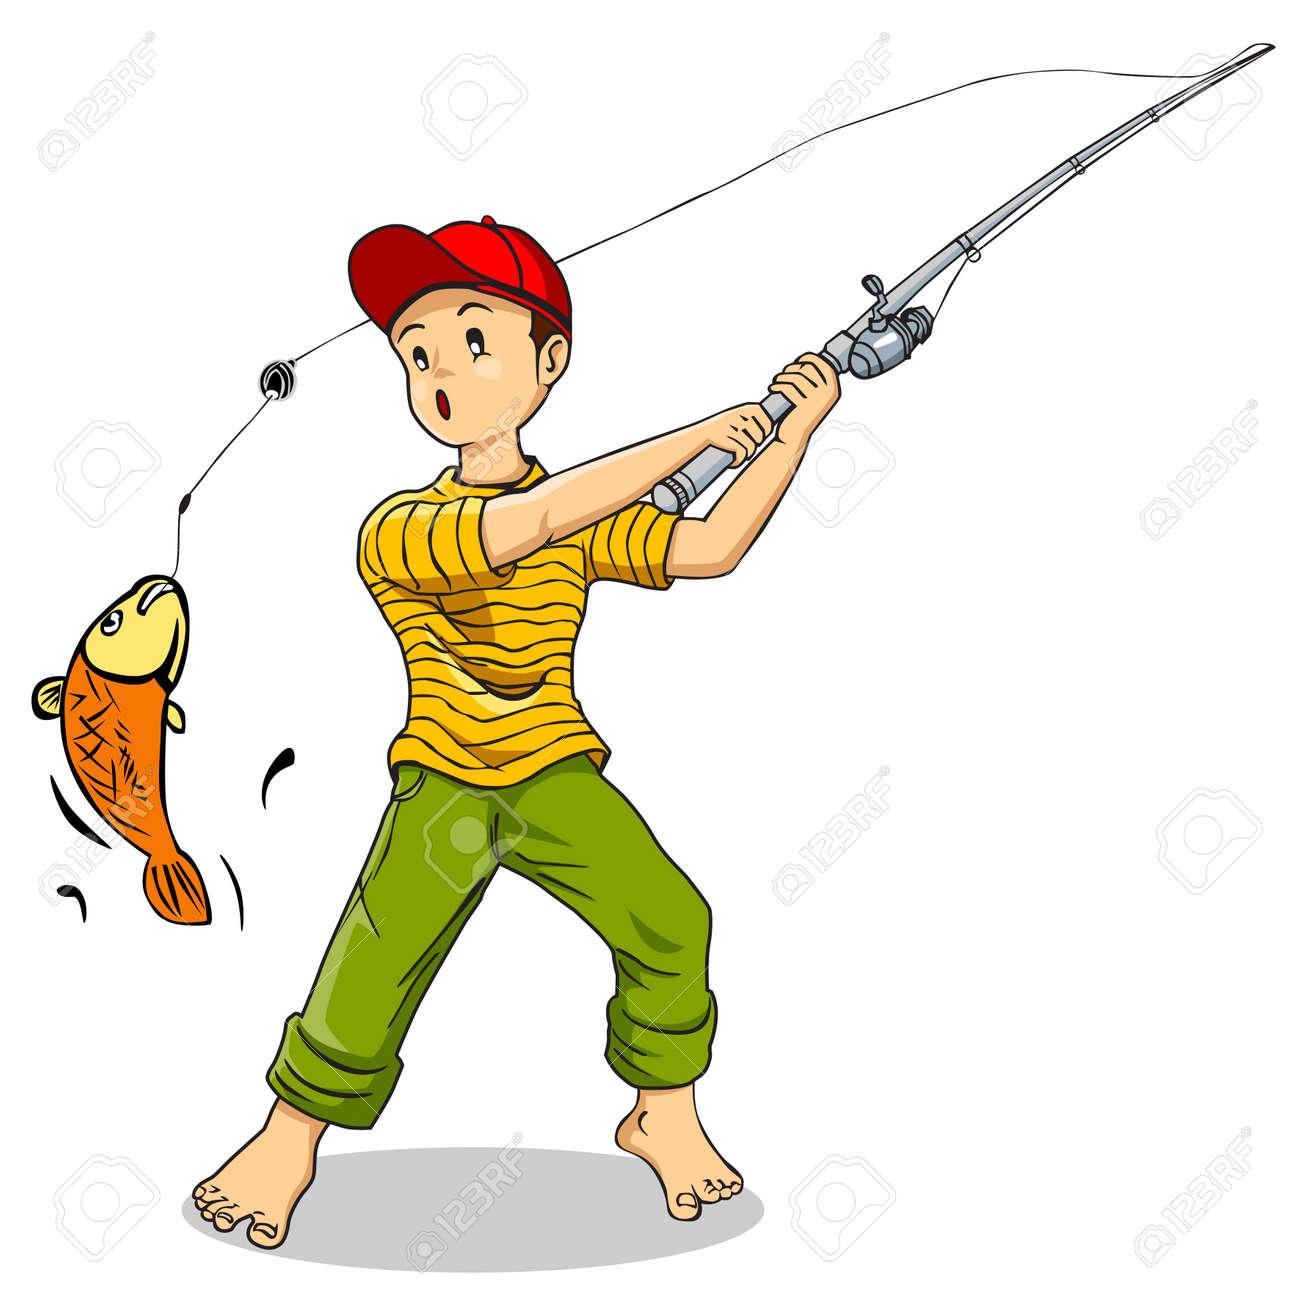 Cartoon illustration of a boy fishing Stock Vector - 12930192